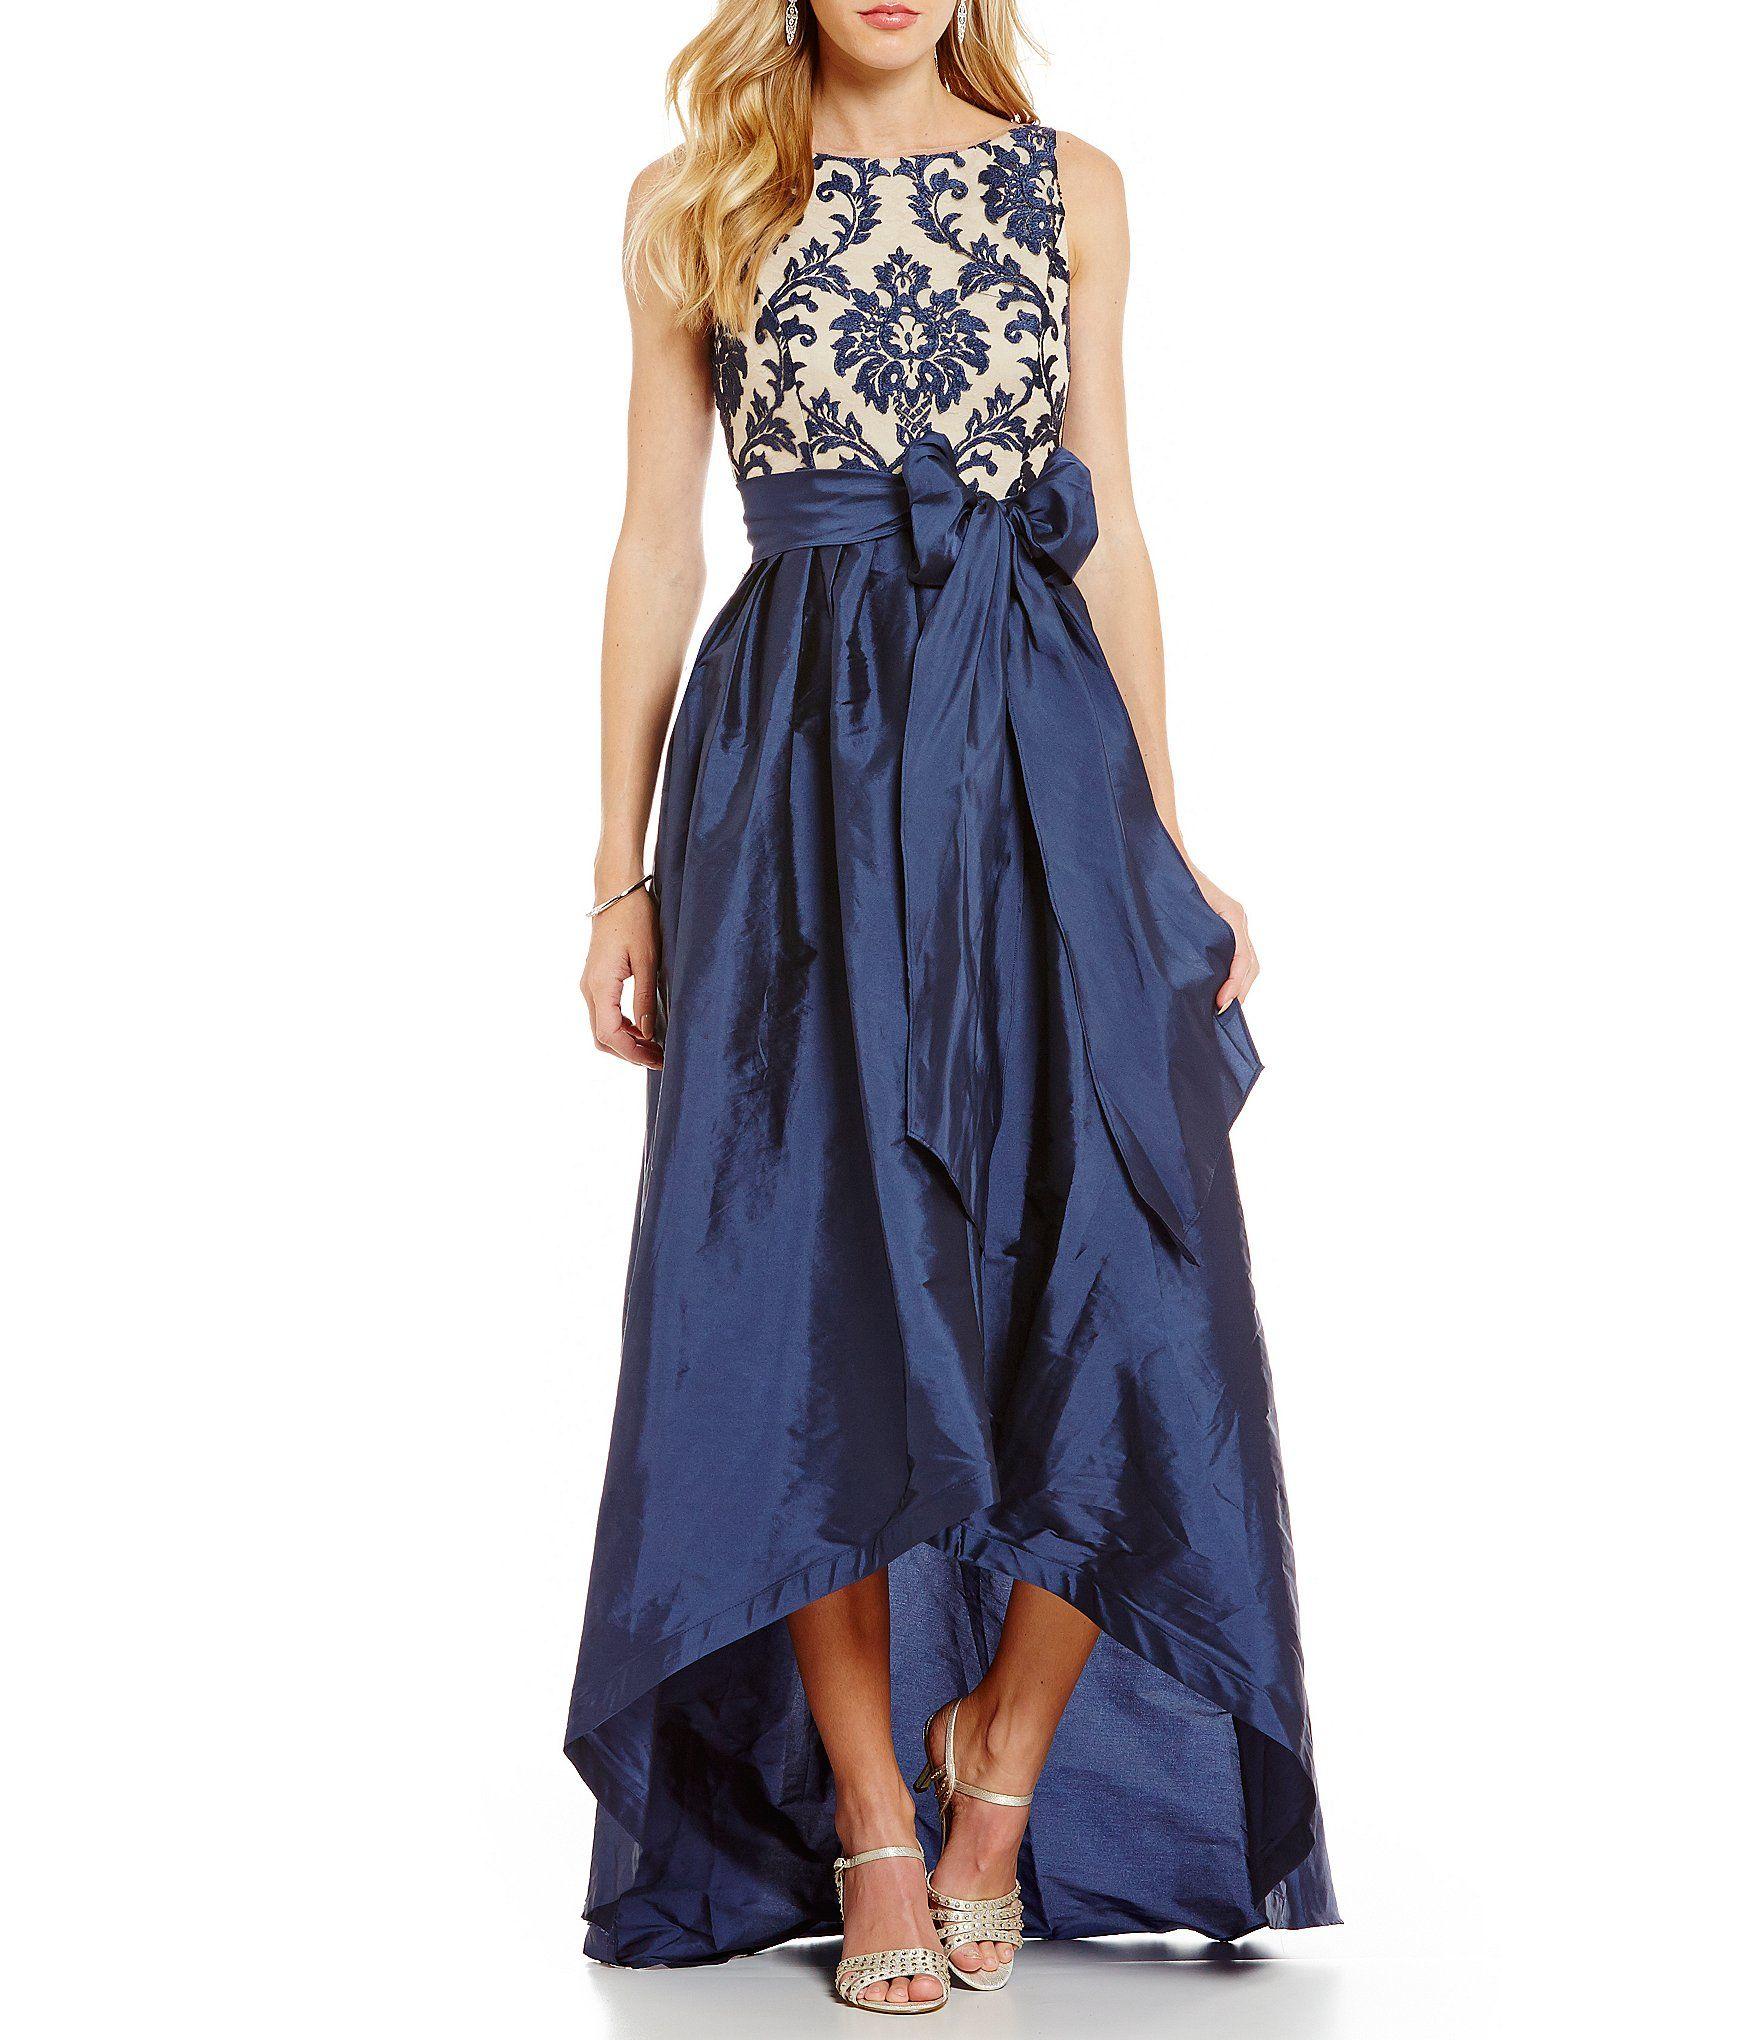 Adrianna Papell Petite Lace Taffeta Hi-Low Gown #Dillards | Get ...